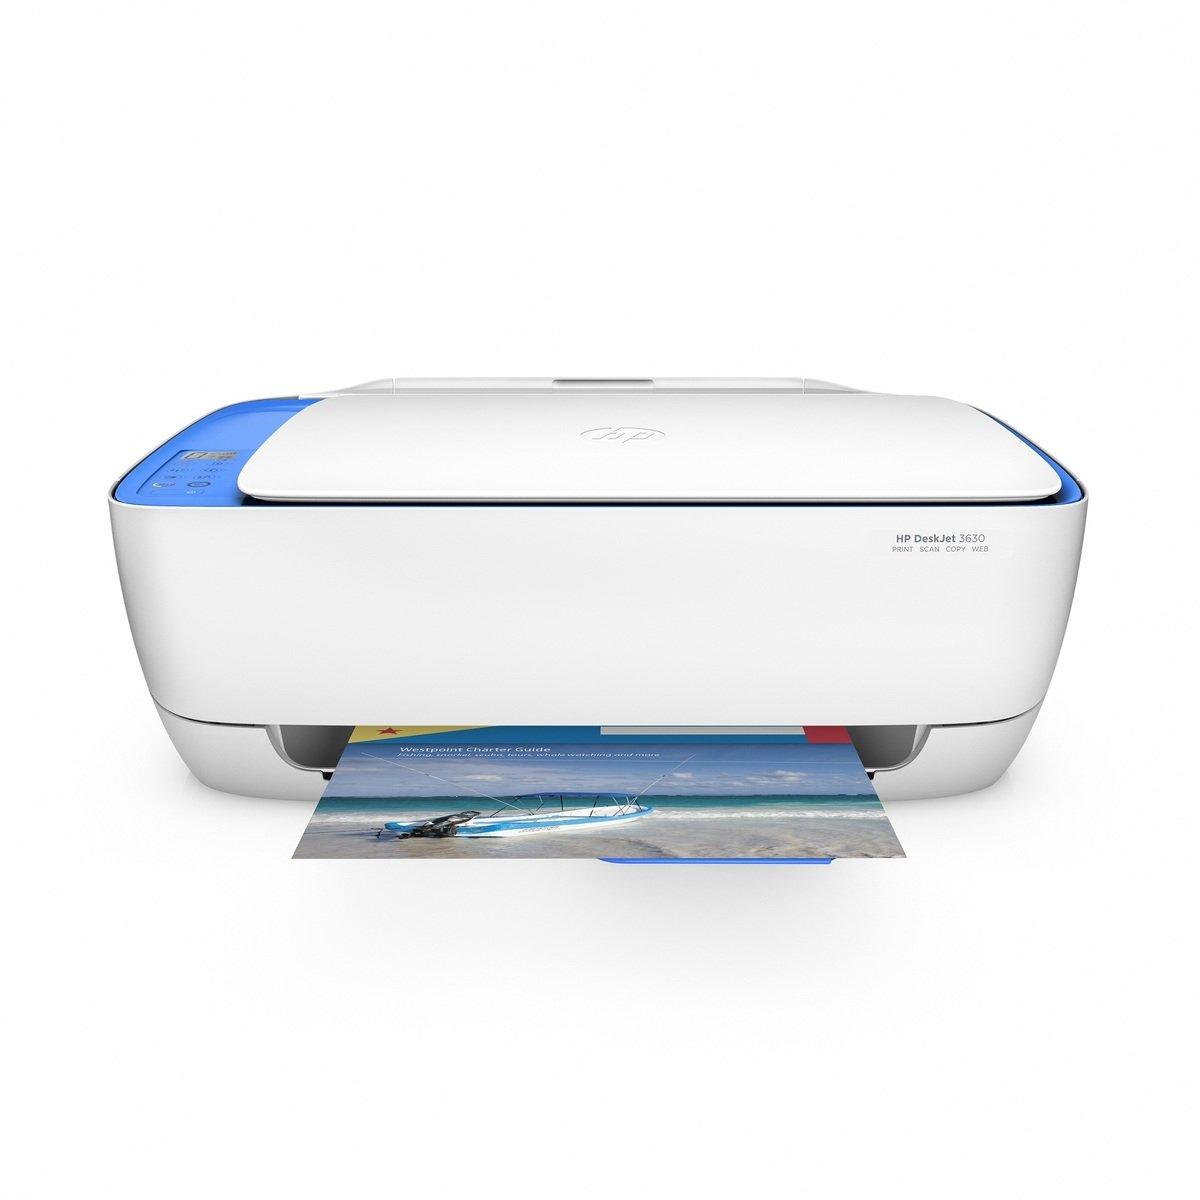 Deskjet 3630 多合一打印機